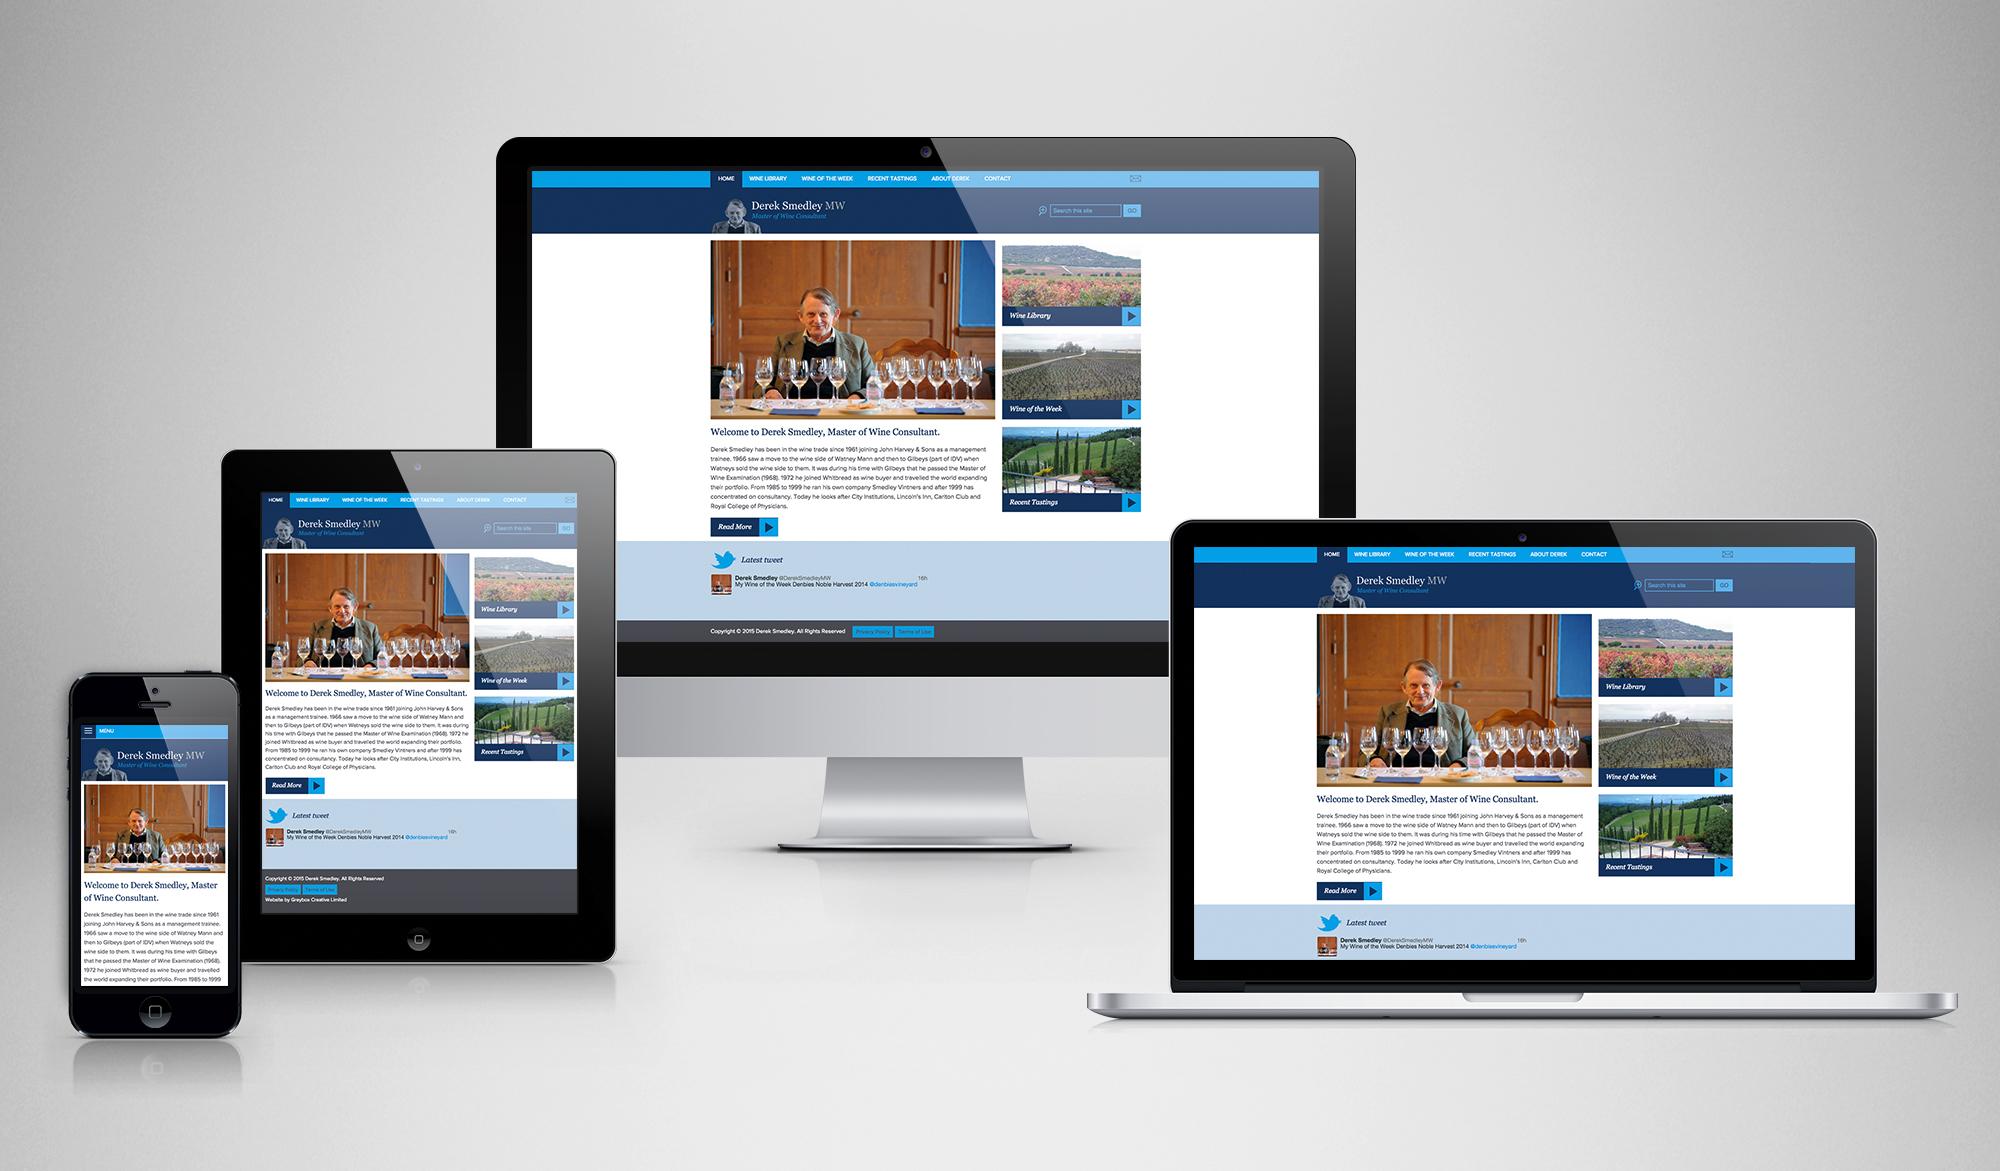 Derek Smedley Responsive website design